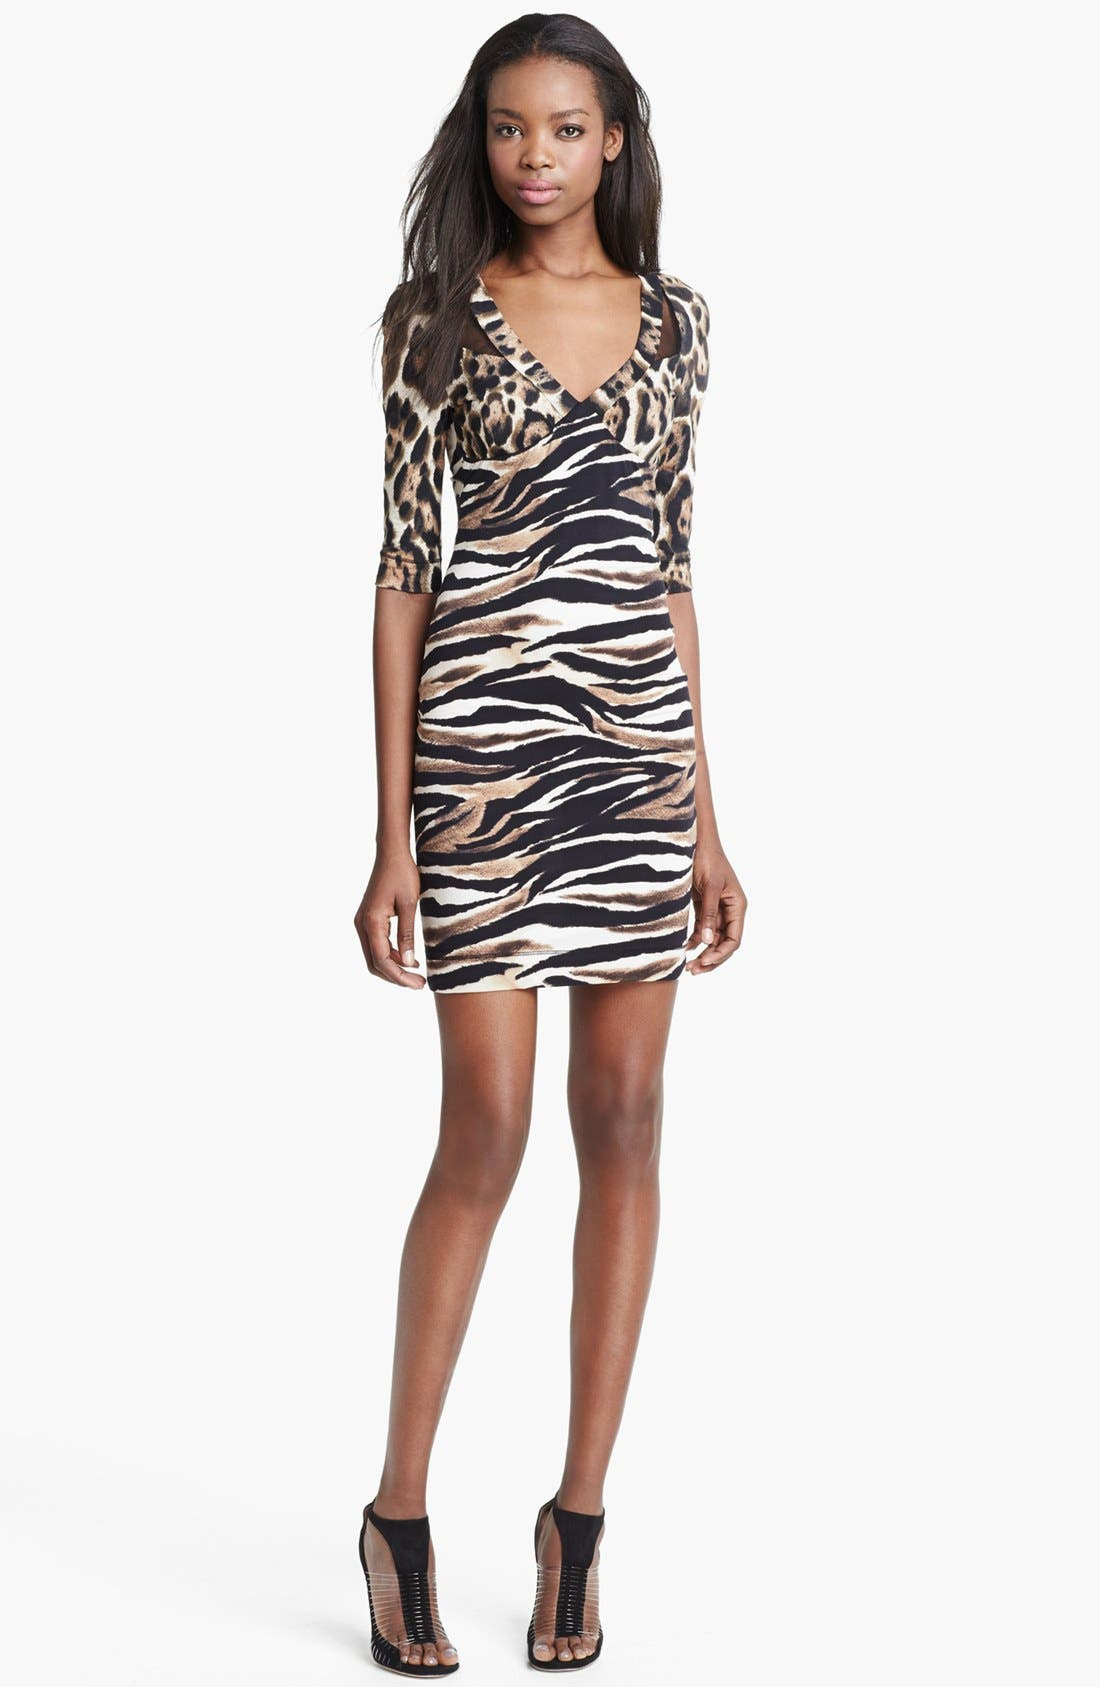 Alternate Image 1 Selected - Just Cavalli Leopard & Zebra Print Jersey Dress